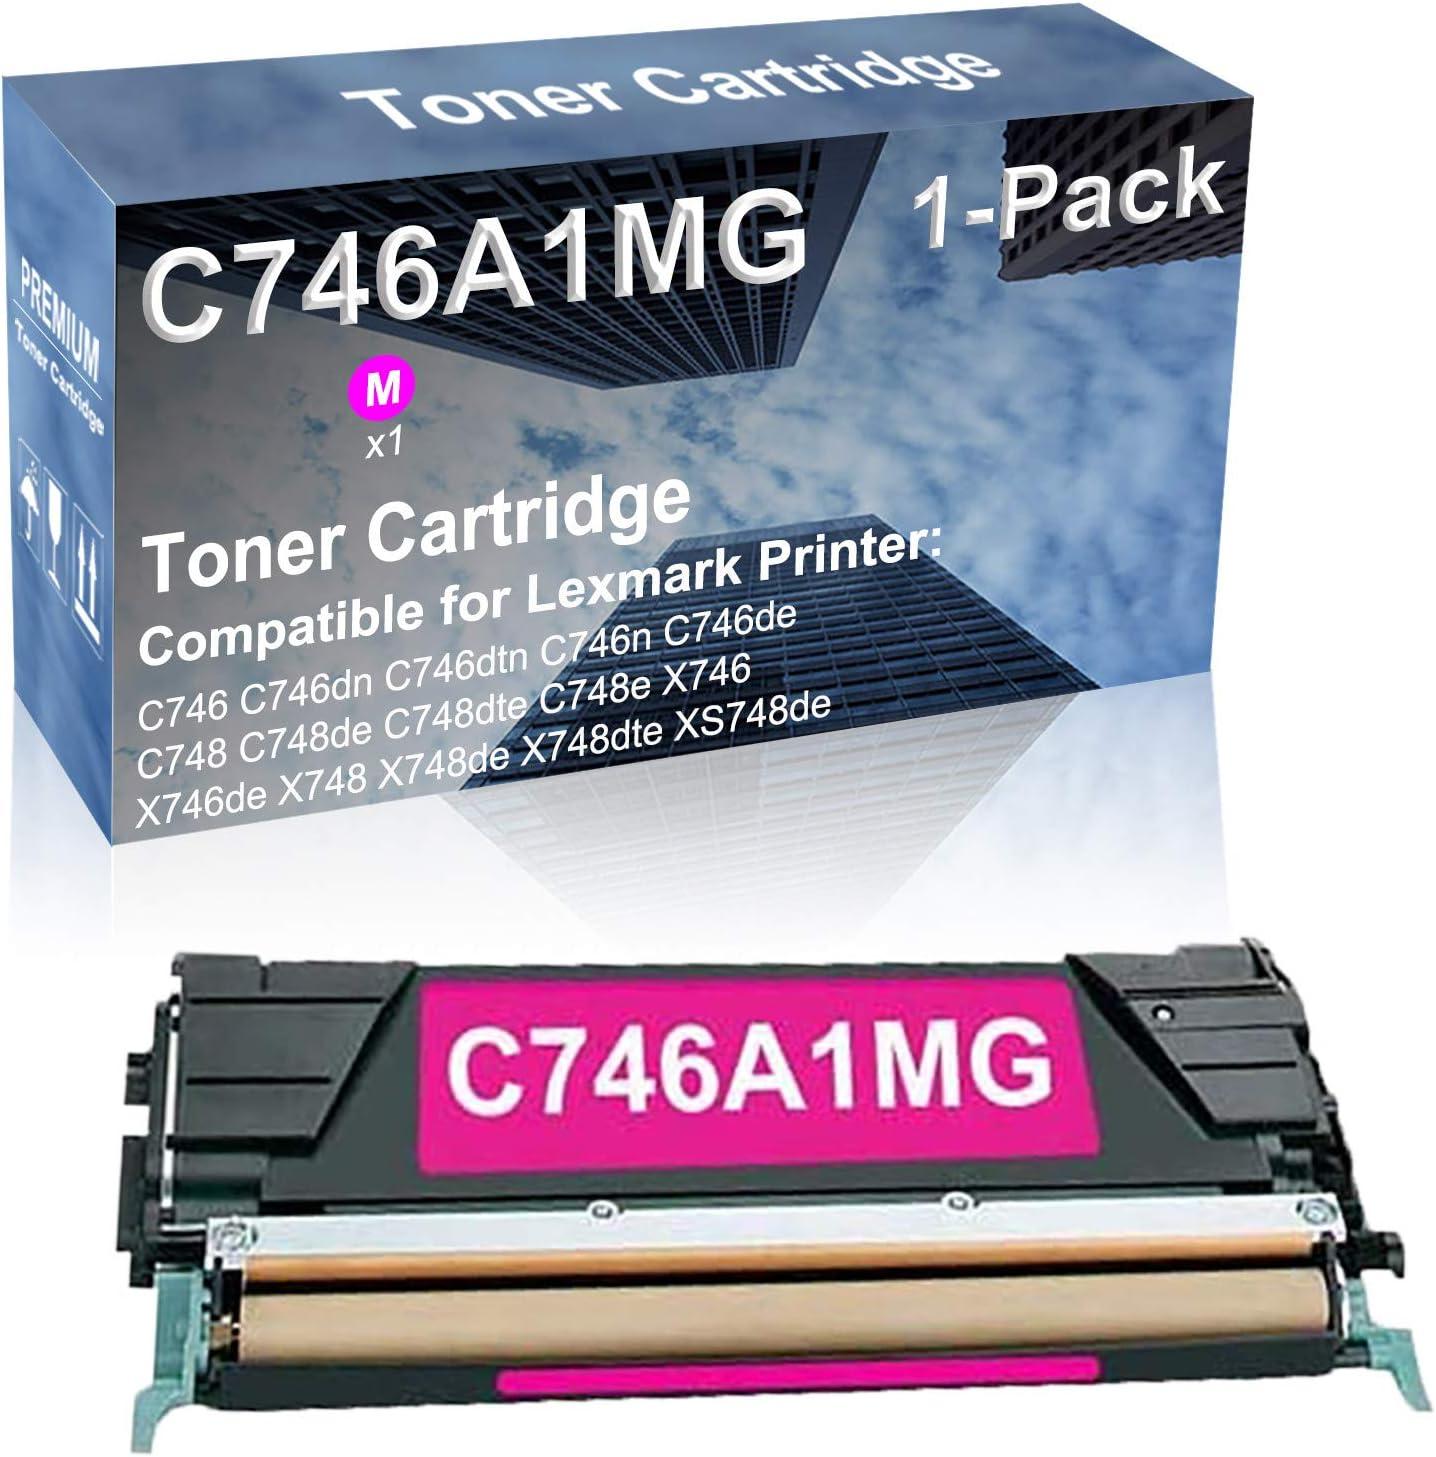 1-Pack (Magenta) Compatible C748 C748de C748dte C748e X746 Printer Toner Cartridge High Capacity Replacement for Lexmark C746A1MG Toner Cartridge